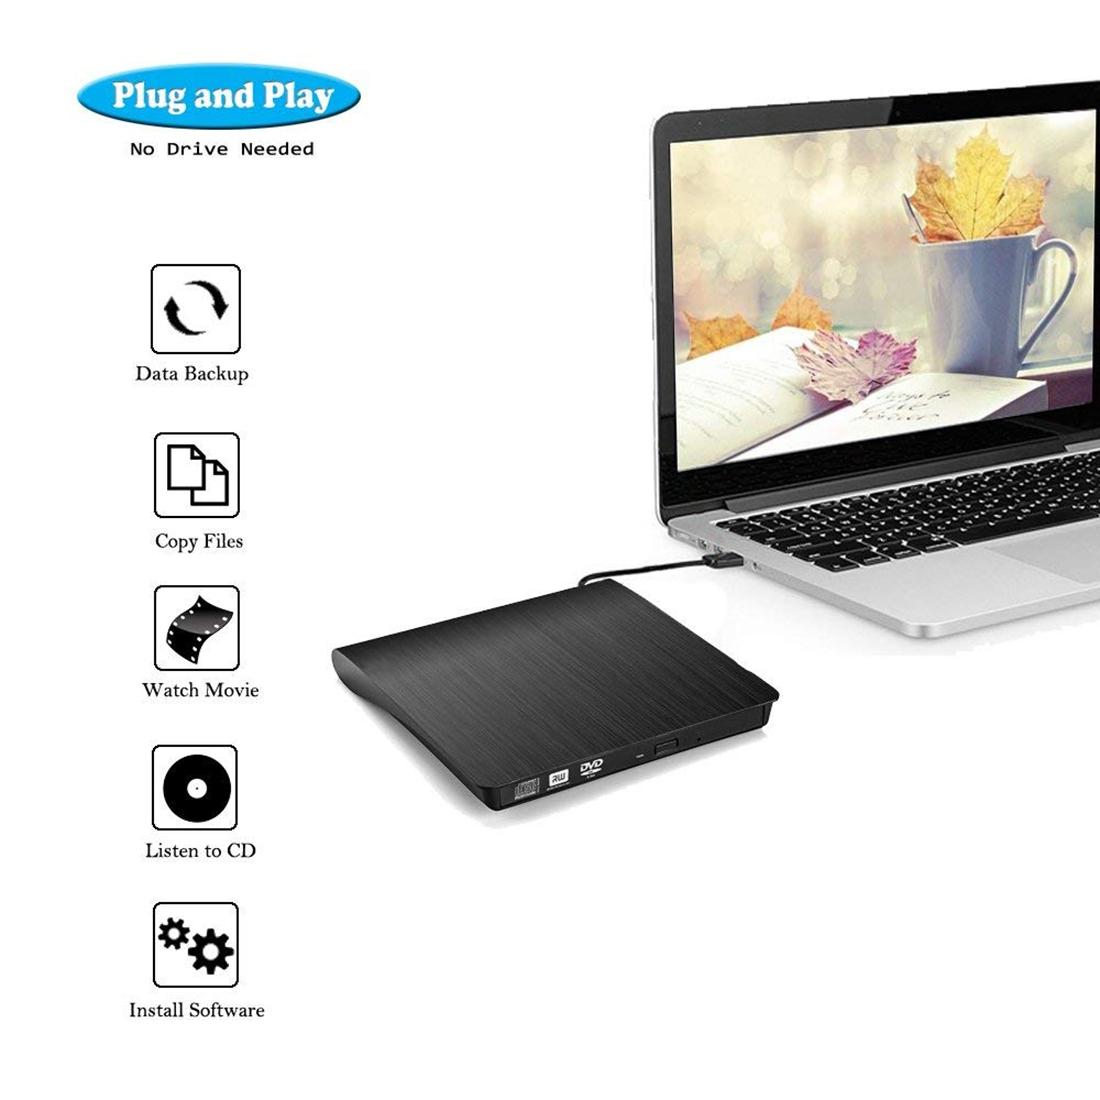 Brushed Texture USB 3.0 POP-UP Mobile External DVD-Rw DVD / CD Rewritable Drive External ODD & HDD Device